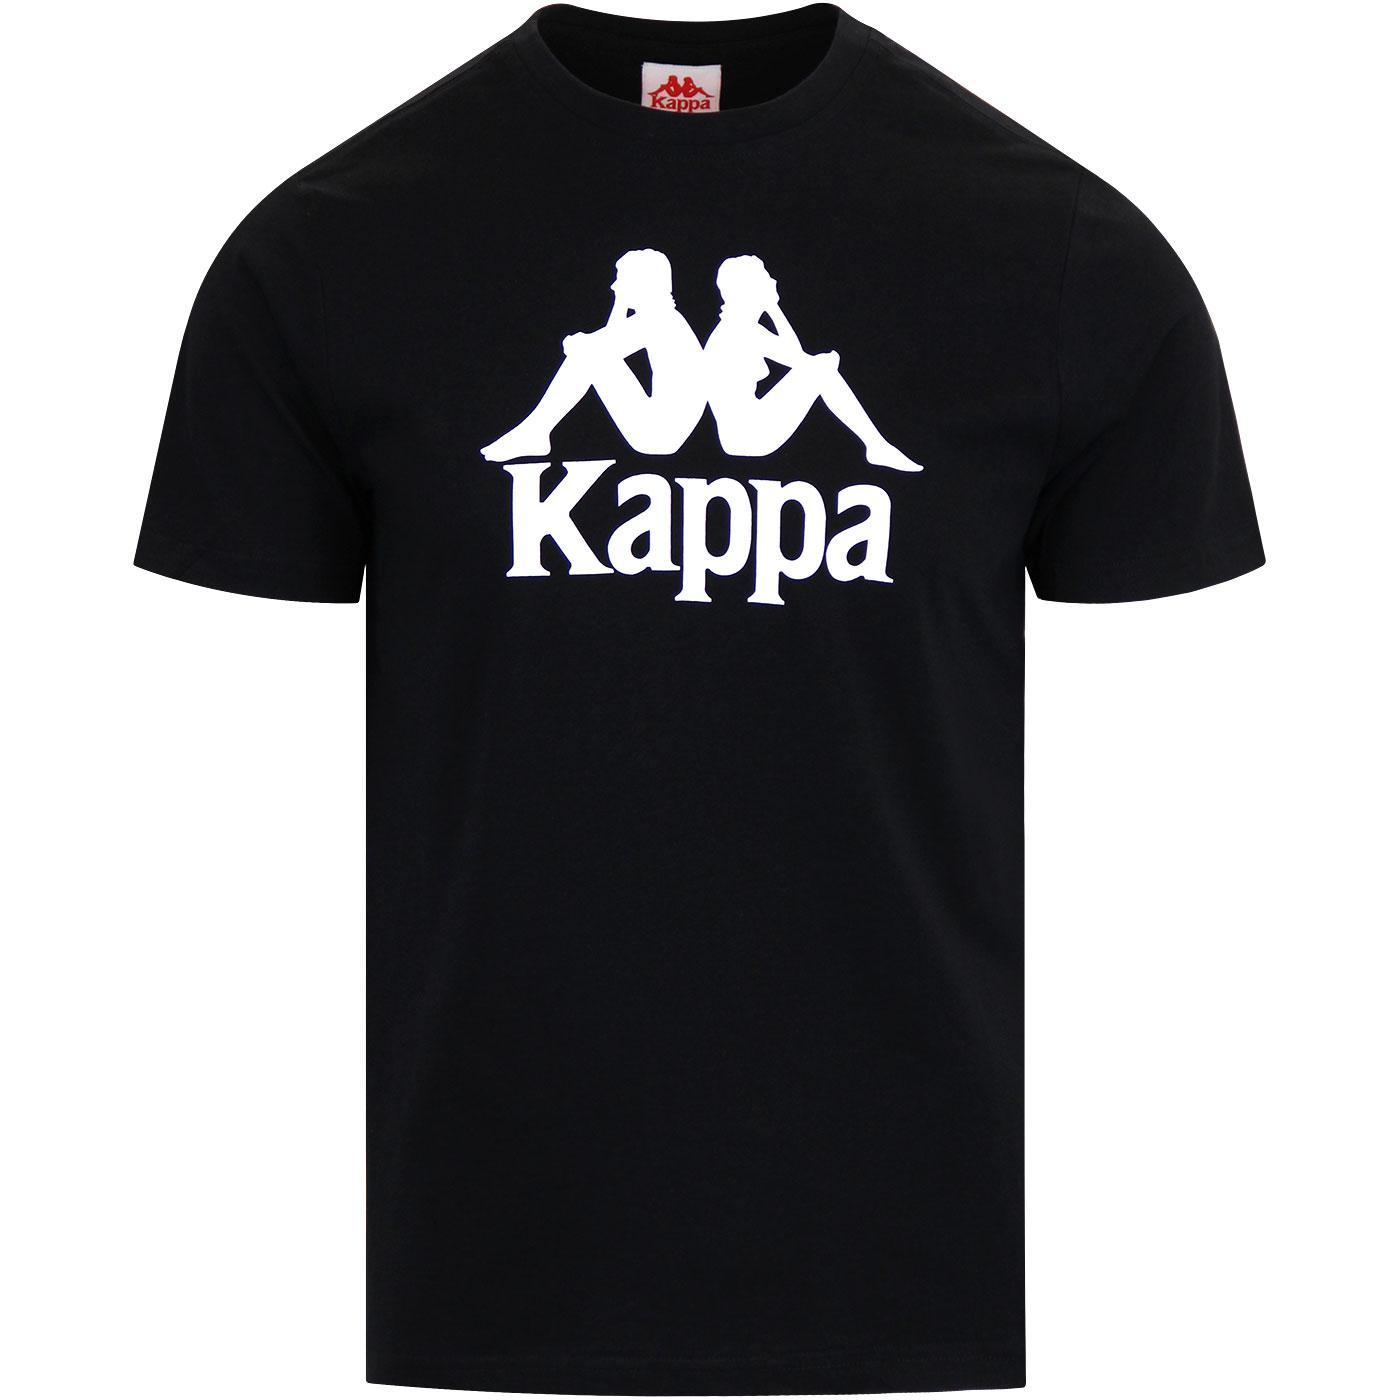 Estessi KAPPA Authentic Graphic Logo T-Shirt BLACK